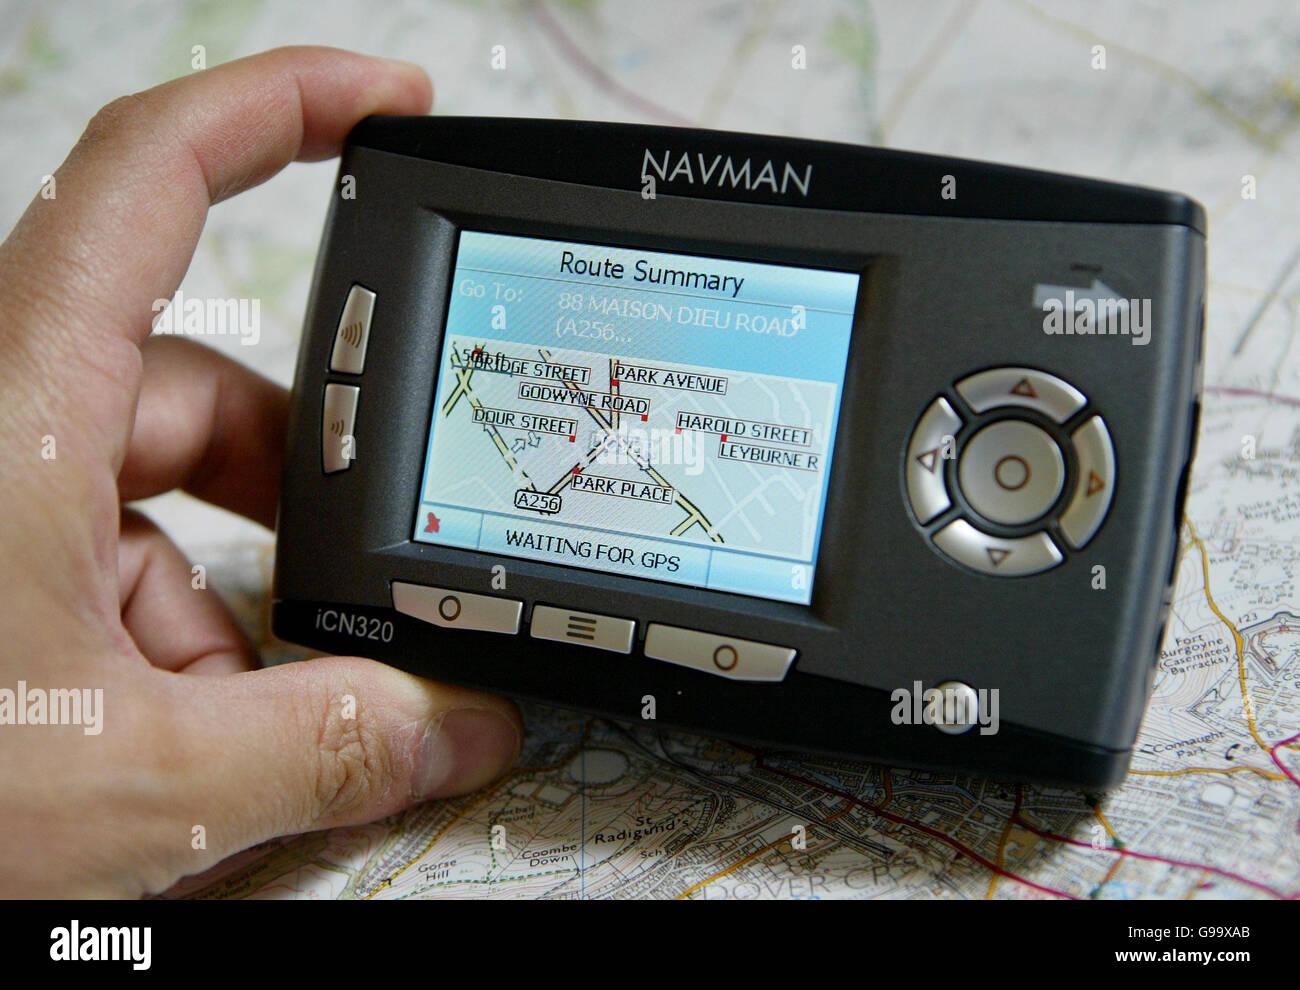 An in-built satellite navigation system, sat nav in a car. - Stock Image